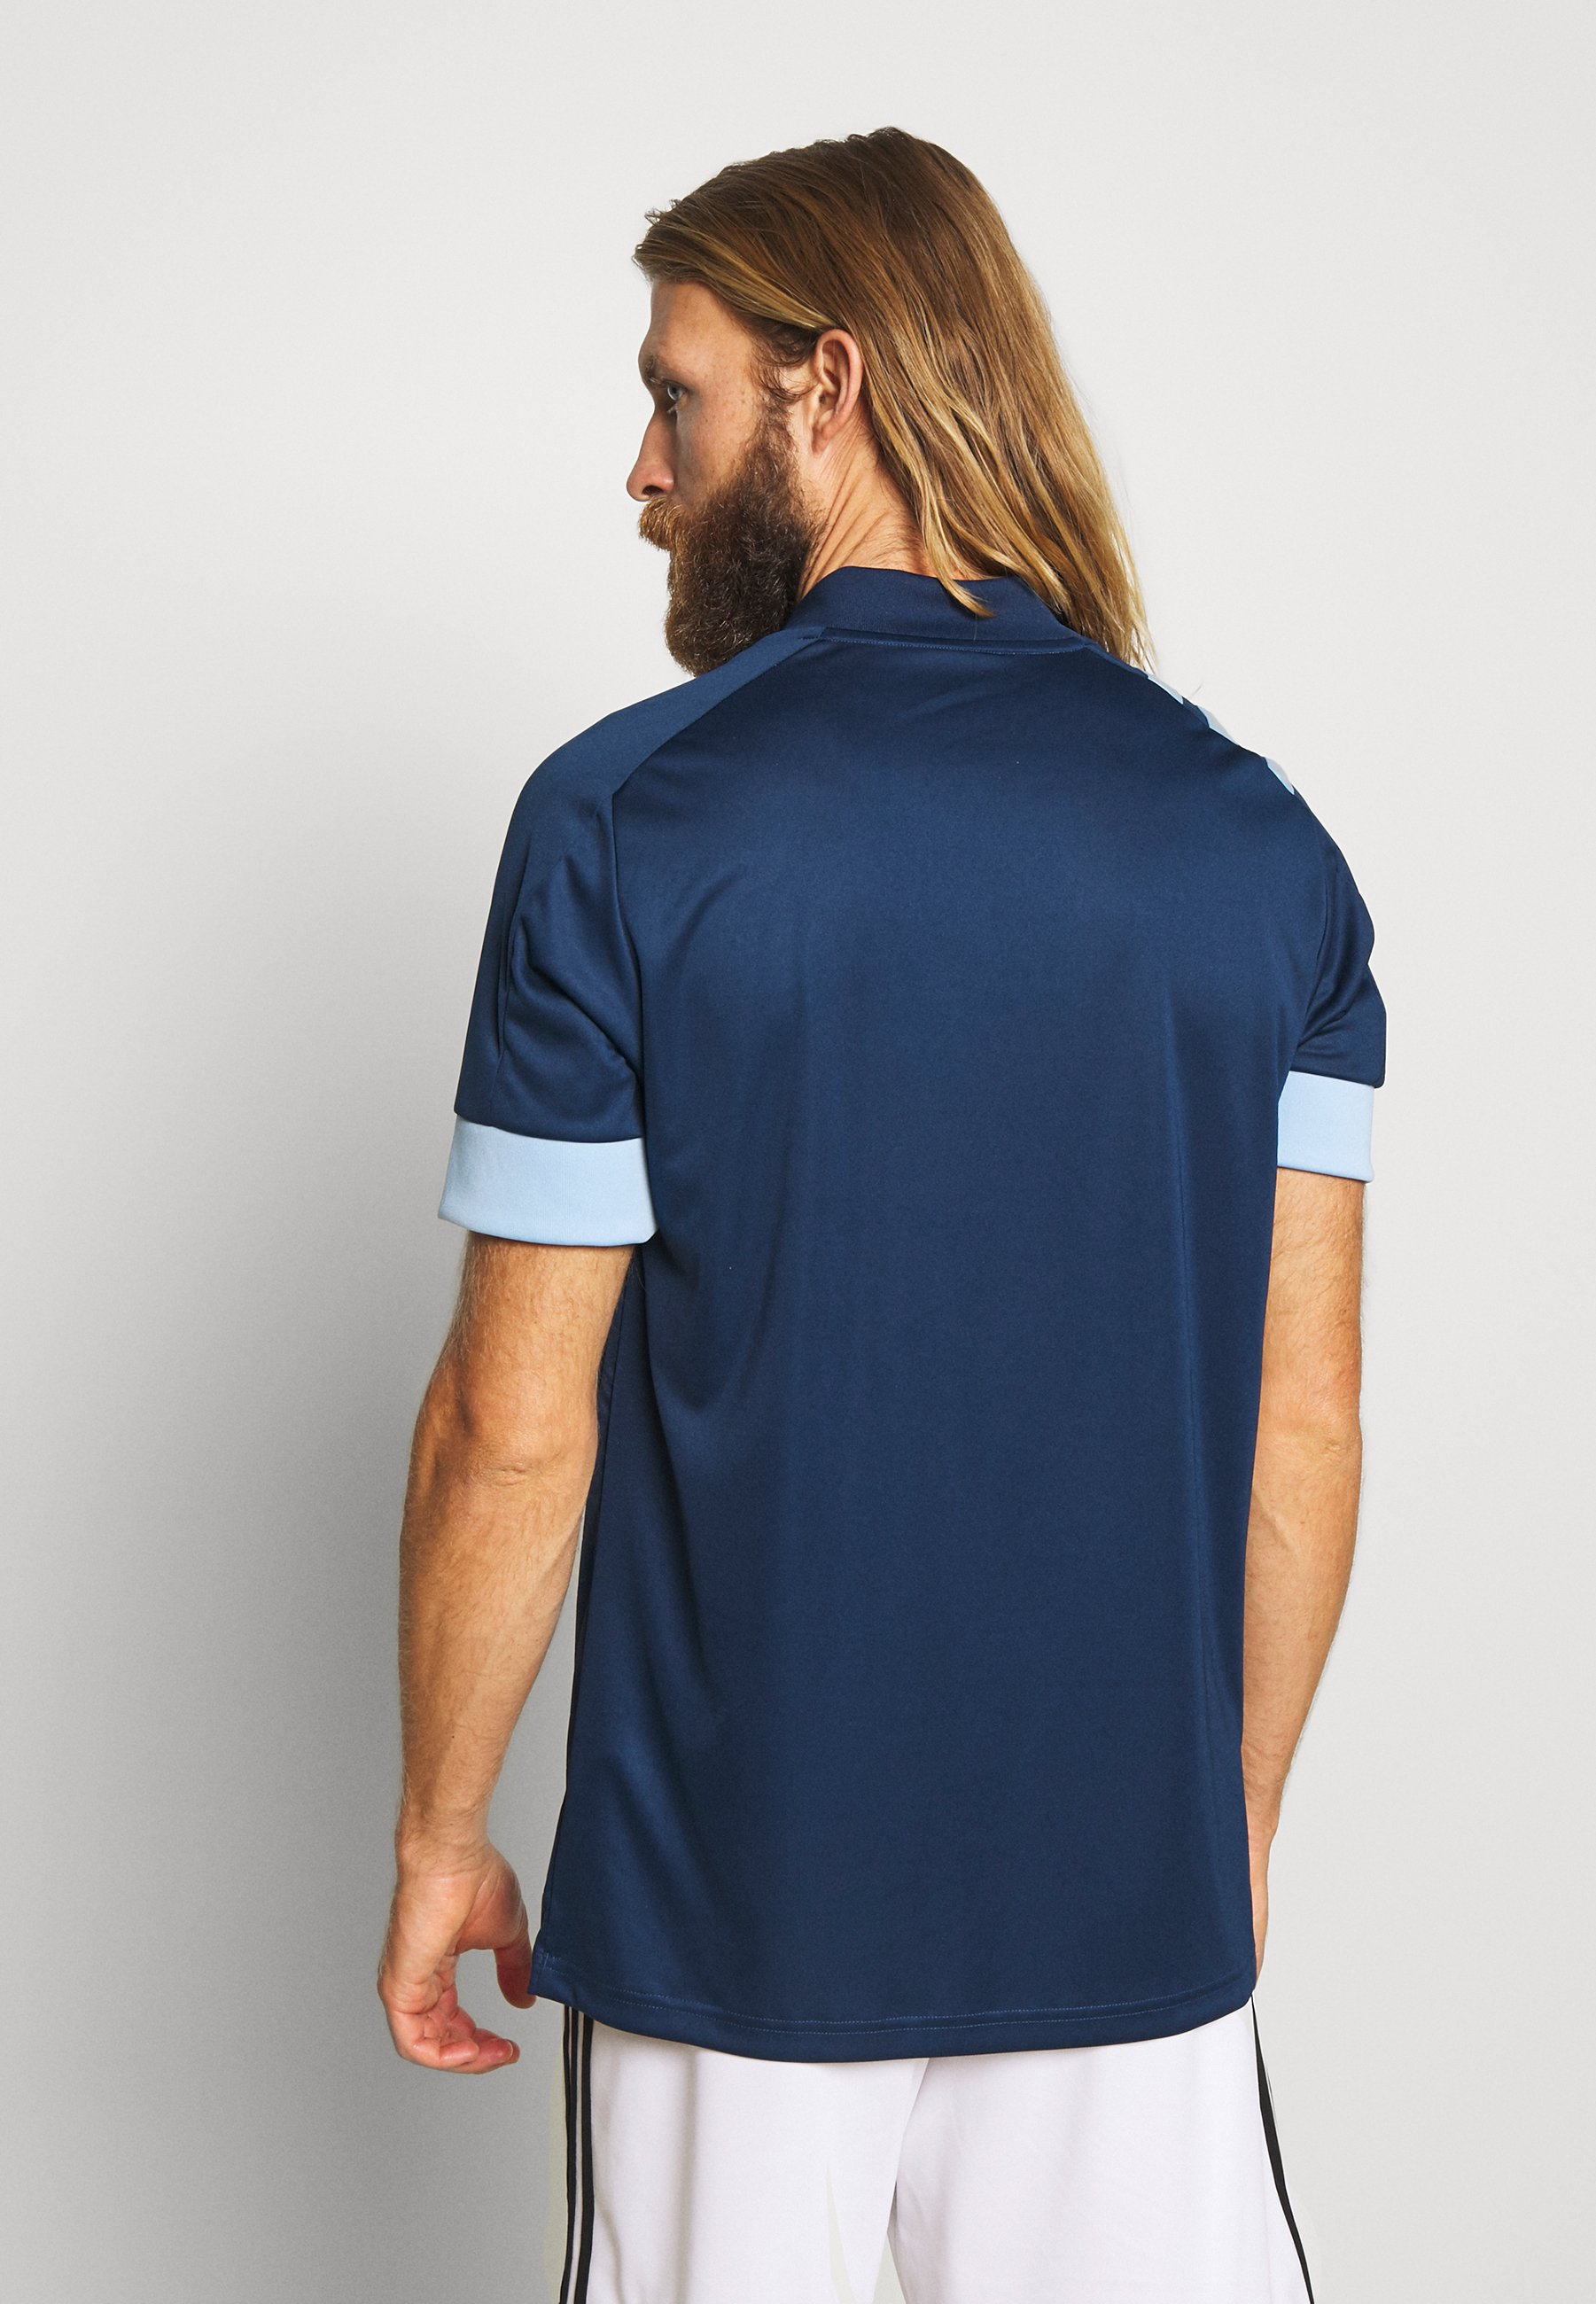 adidas Performance Club wear - blue 5dhFv